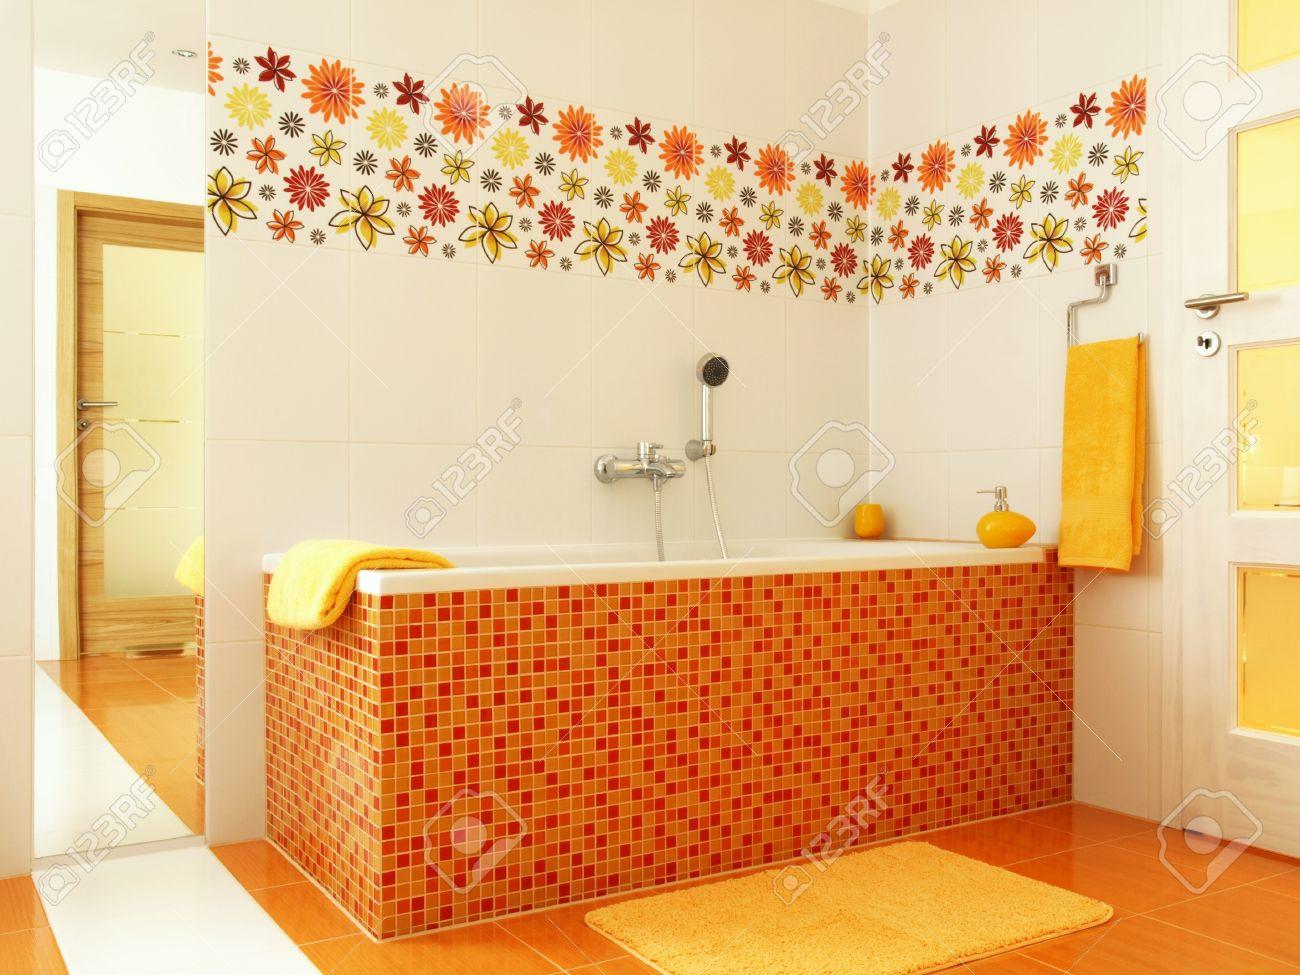 Colorful Bathroom With Orange Mosaic Bathtub And Yellow Towels Stock Photo    13058289